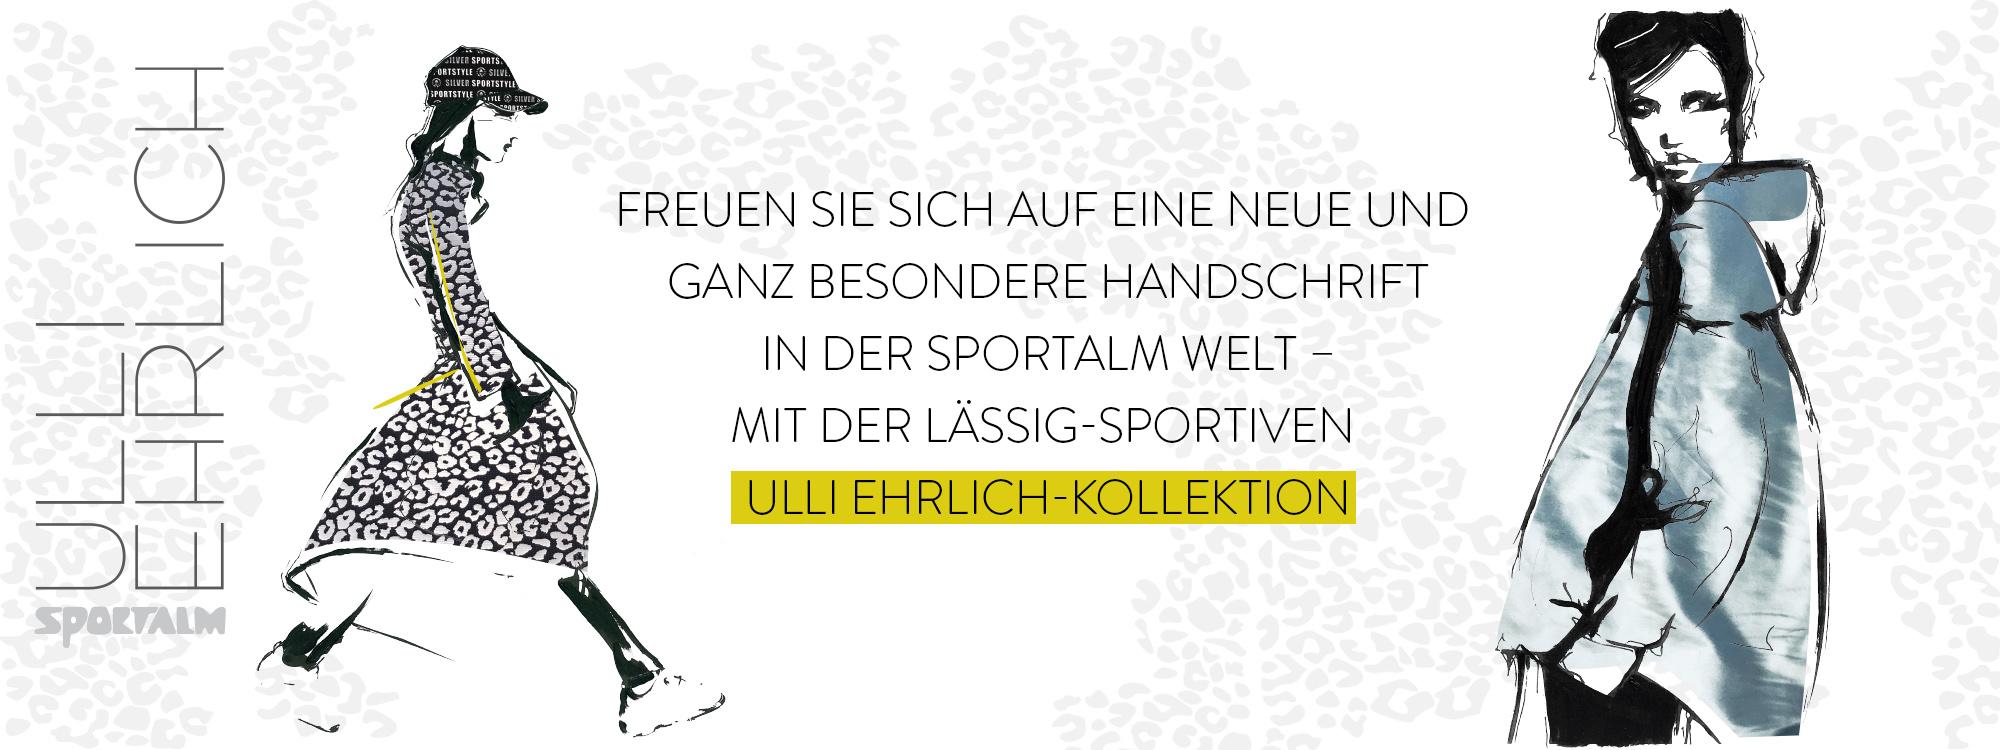 Ulli Ehrlich - Silver Fizz